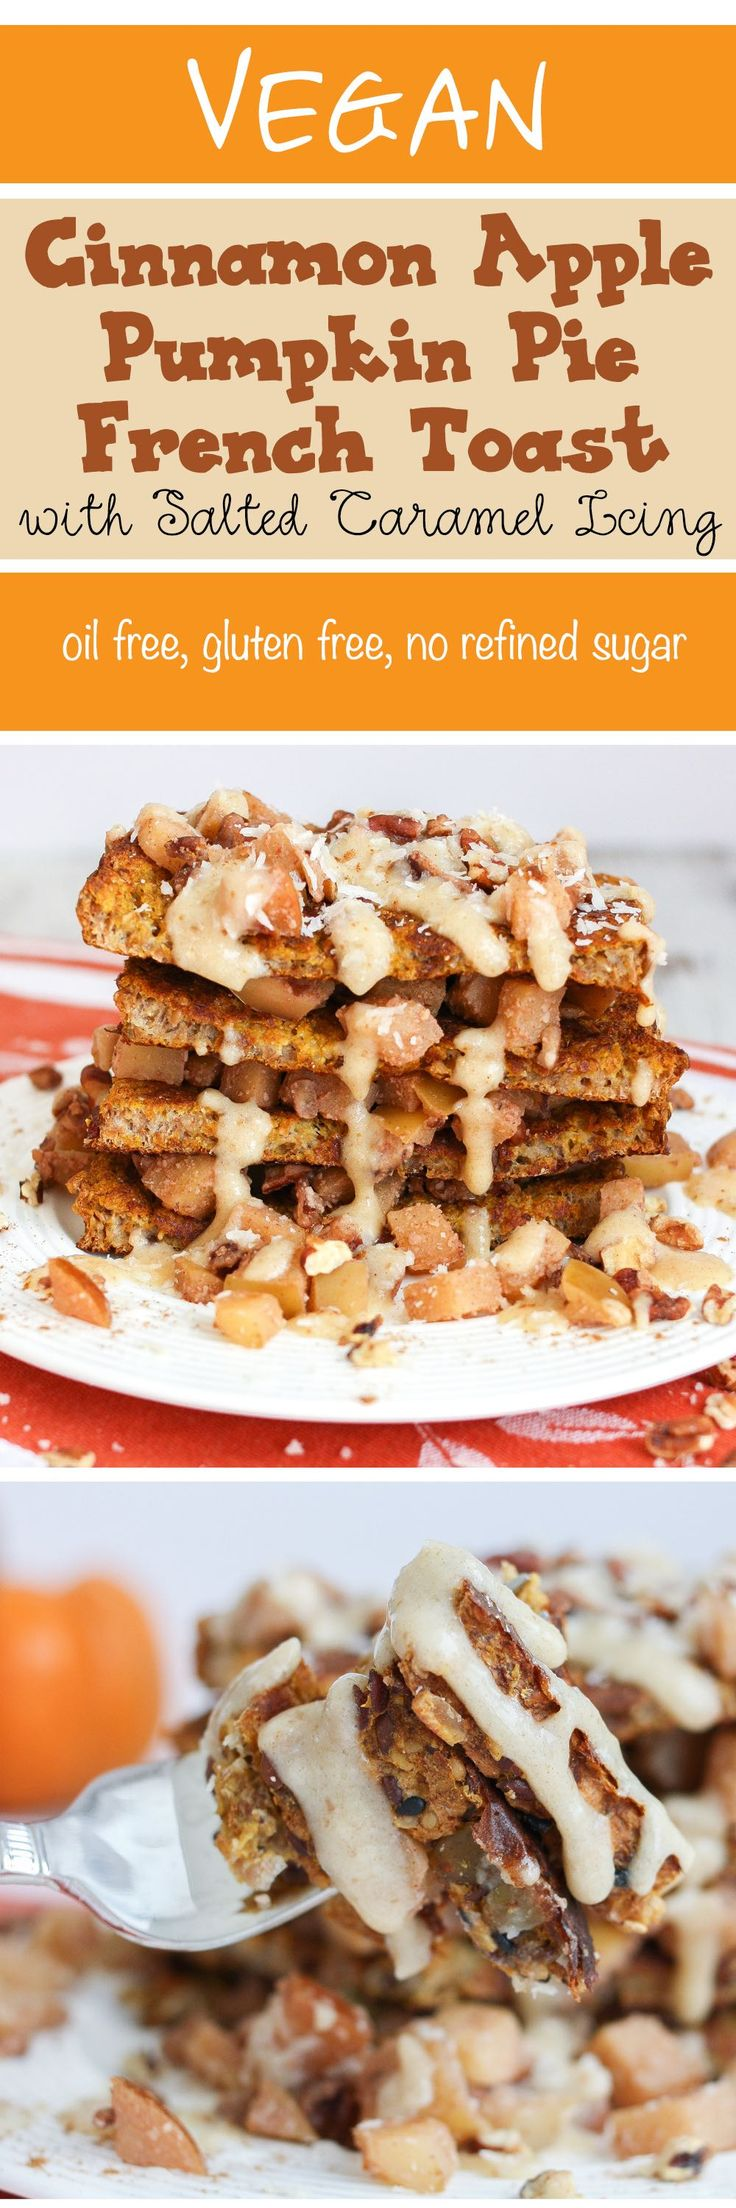 Cinnamon apple pumpkin pie french toast   www.veggiesdontbite.com   #vegan #plantbased #glutenfree #oilfree #breakfast